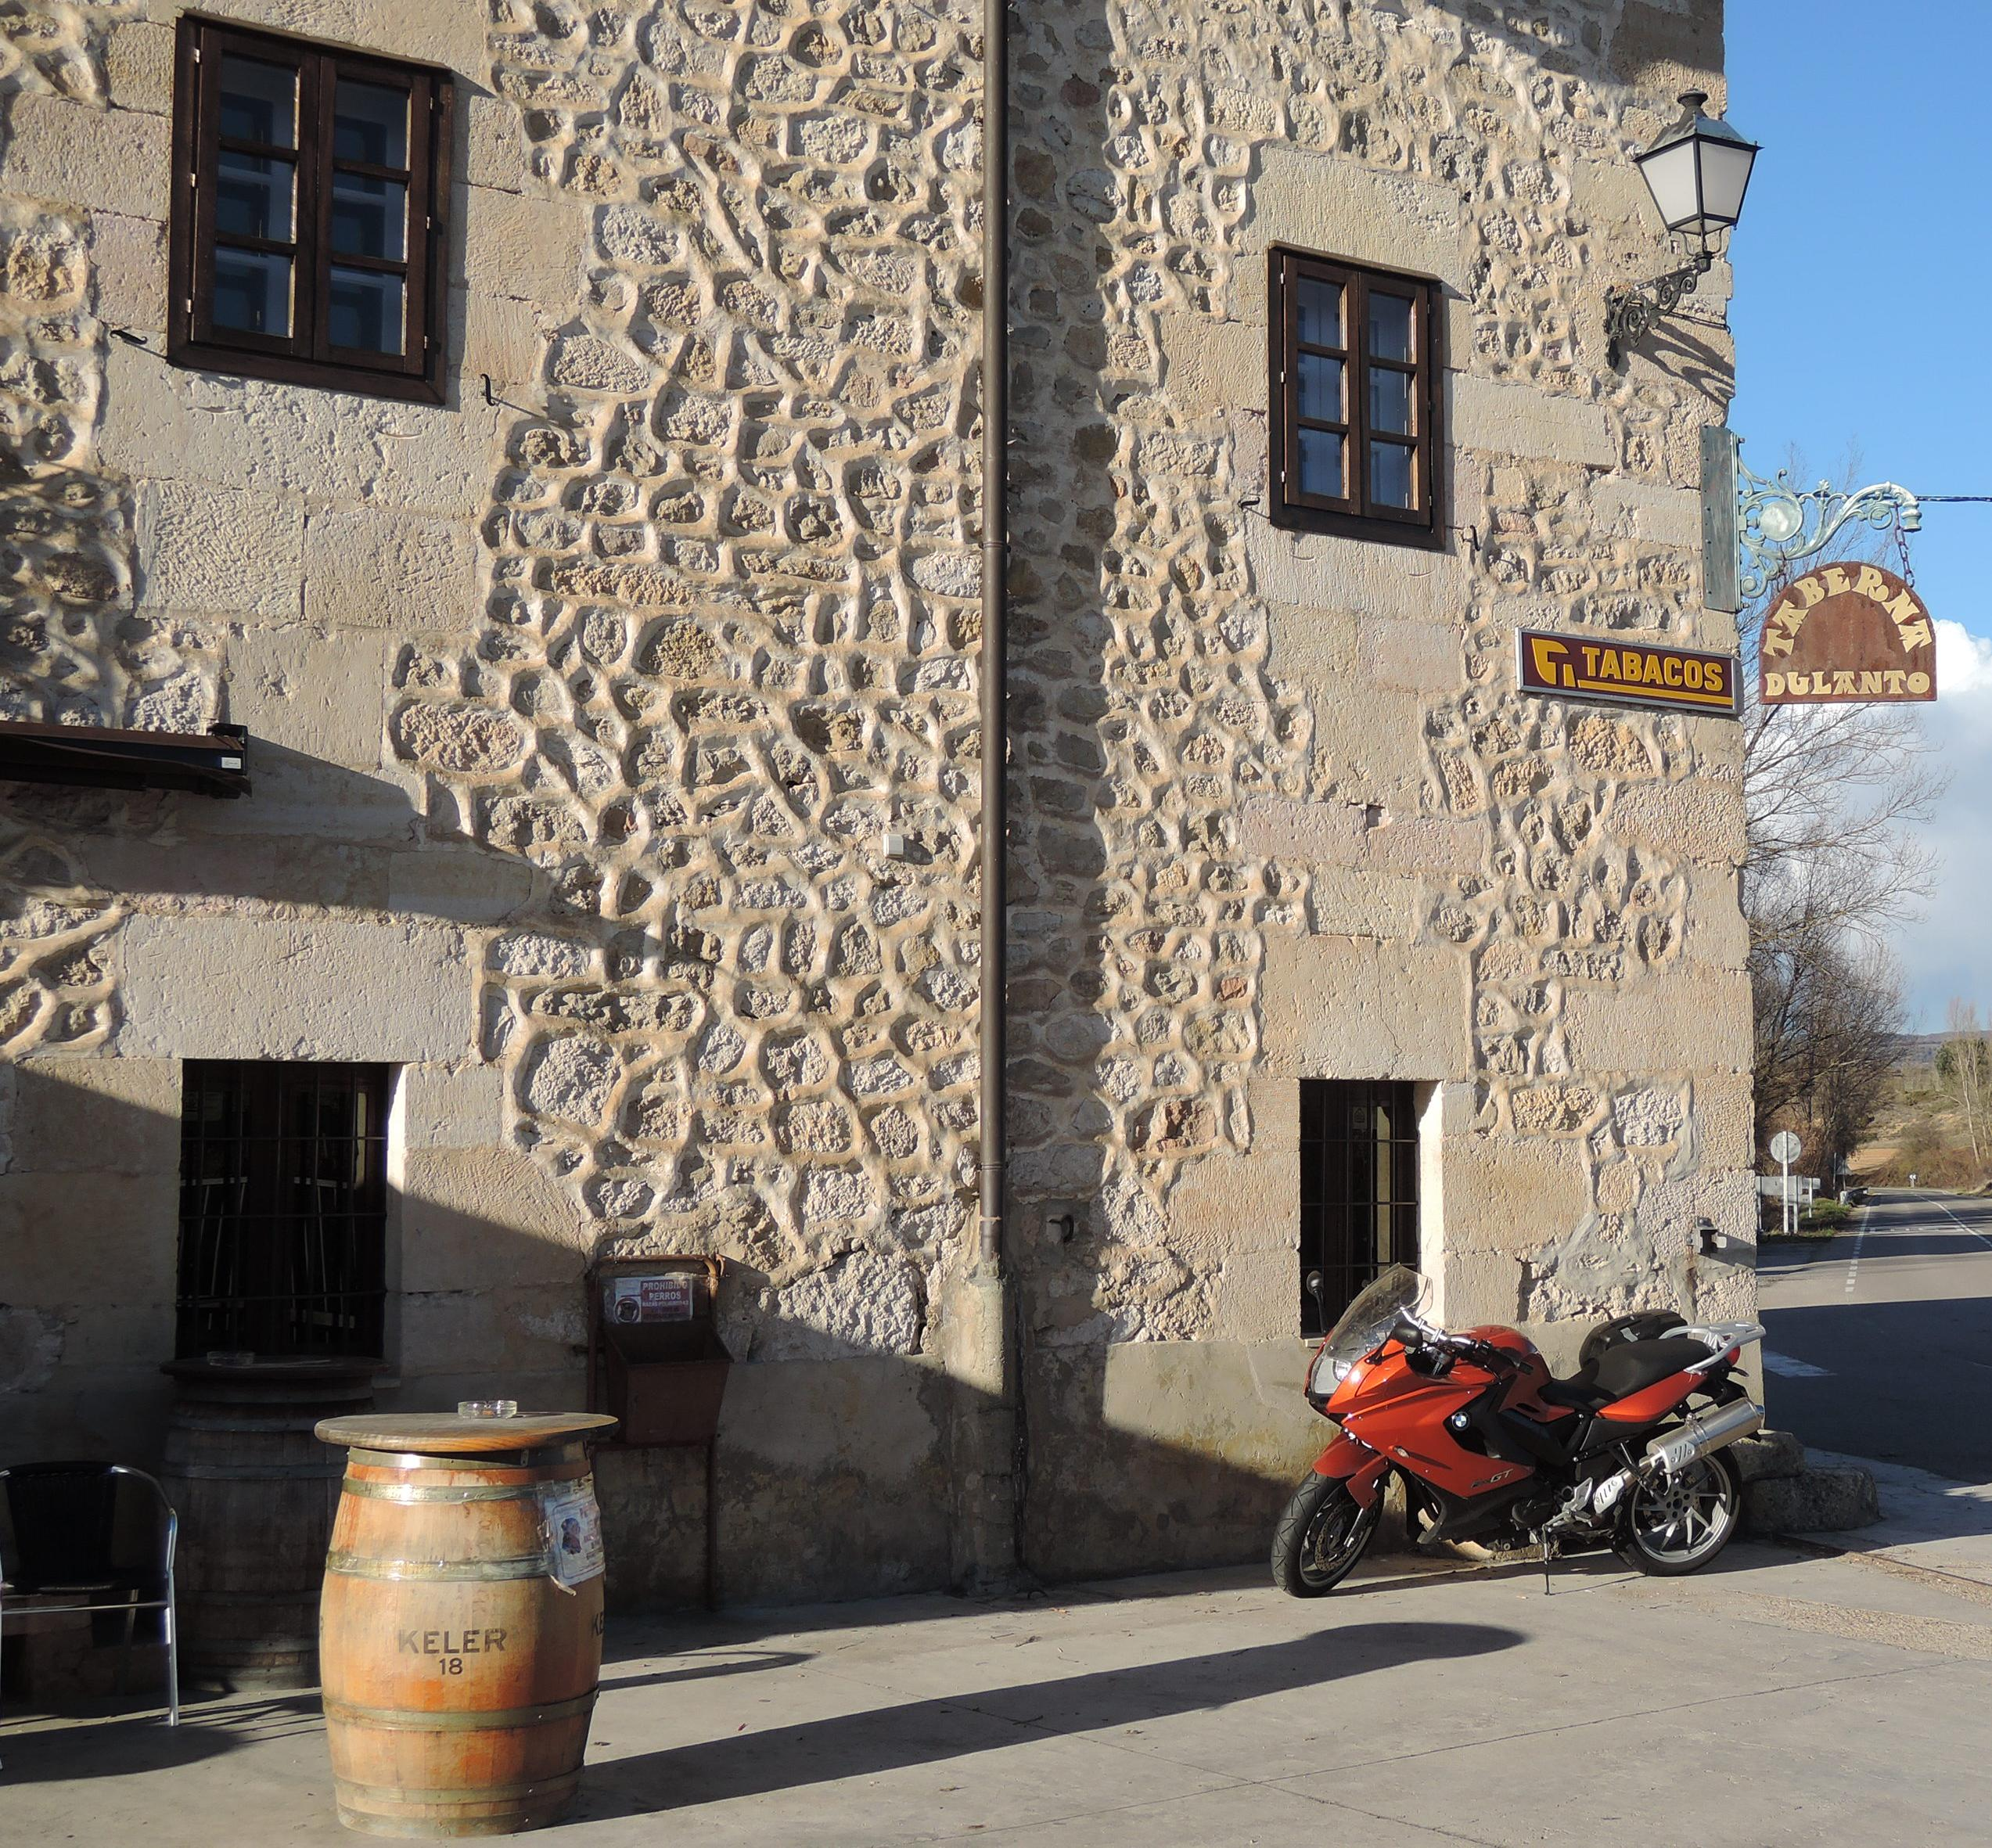 Parada en la taberna Dulanto, Burgos.